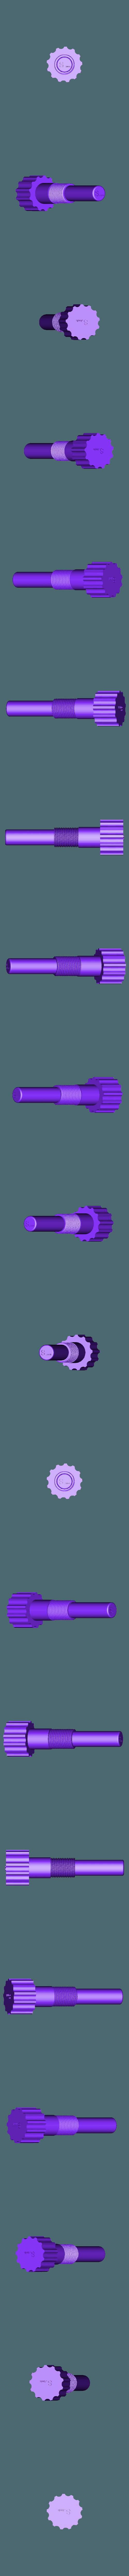 bloc piston v2.stl Download free STL file Piston block - with knurl • 3D printable template, Simonchantcliquet